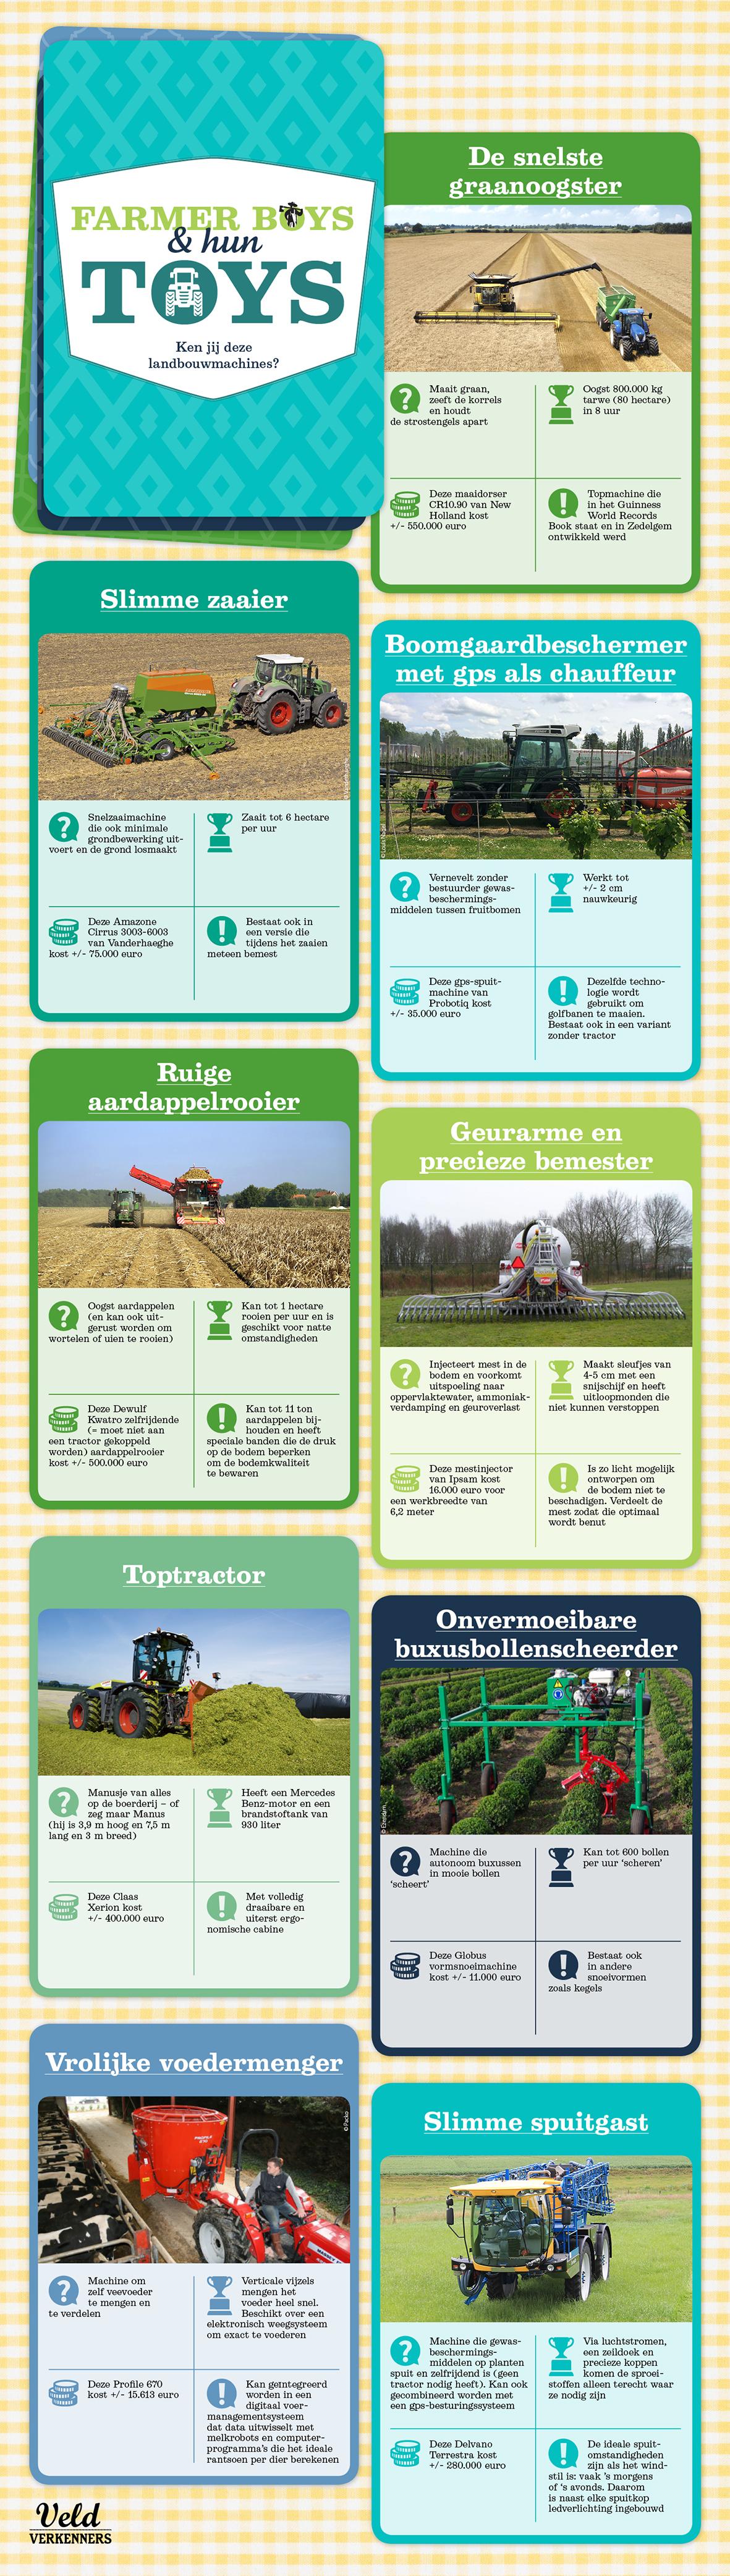 VV_Landbouwmachines_04 (2).jpg